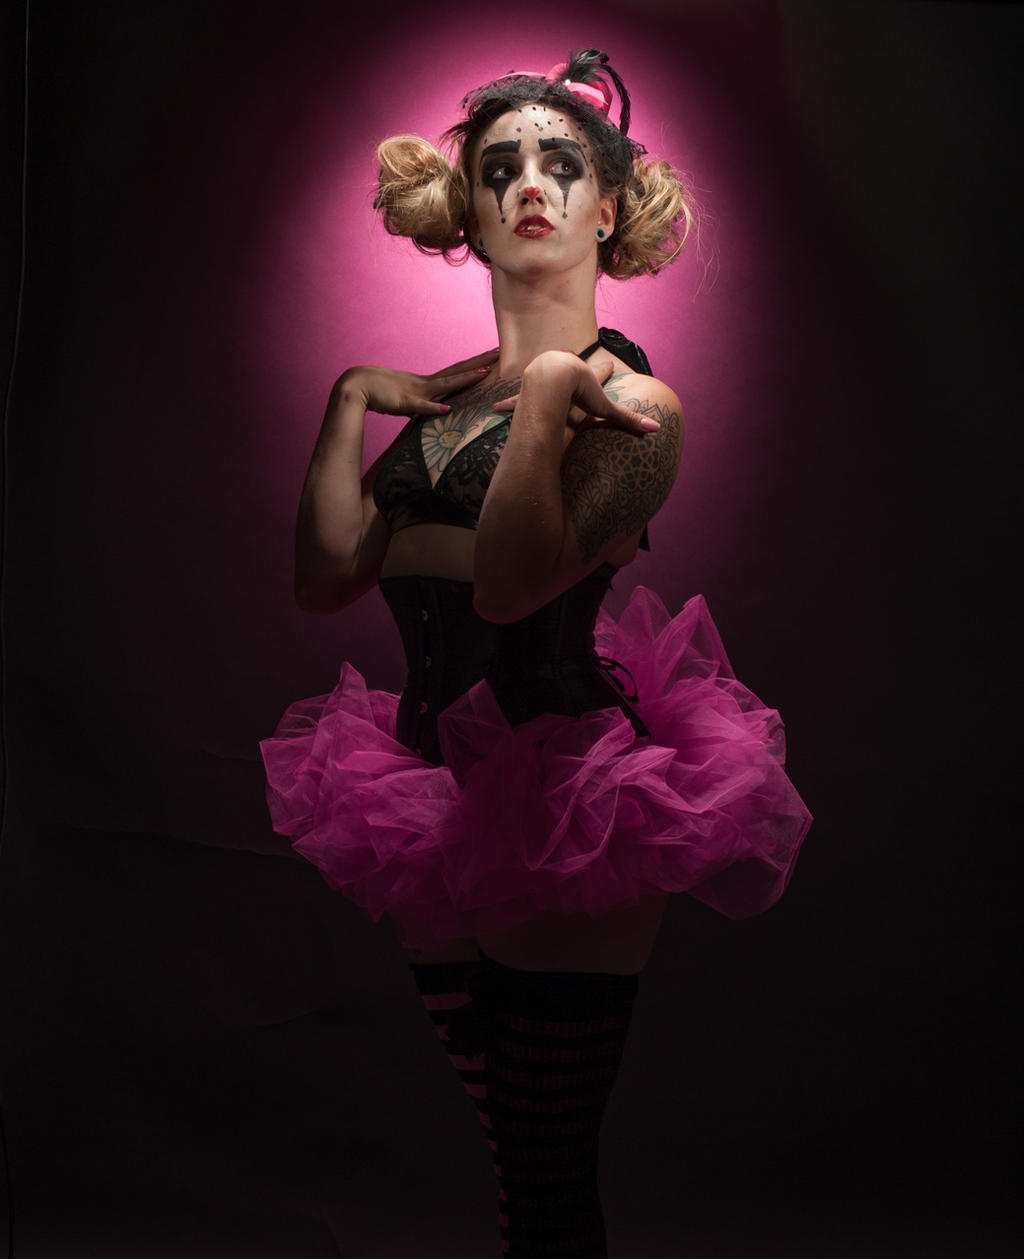 Danailya Clown 001 by jagged-eye